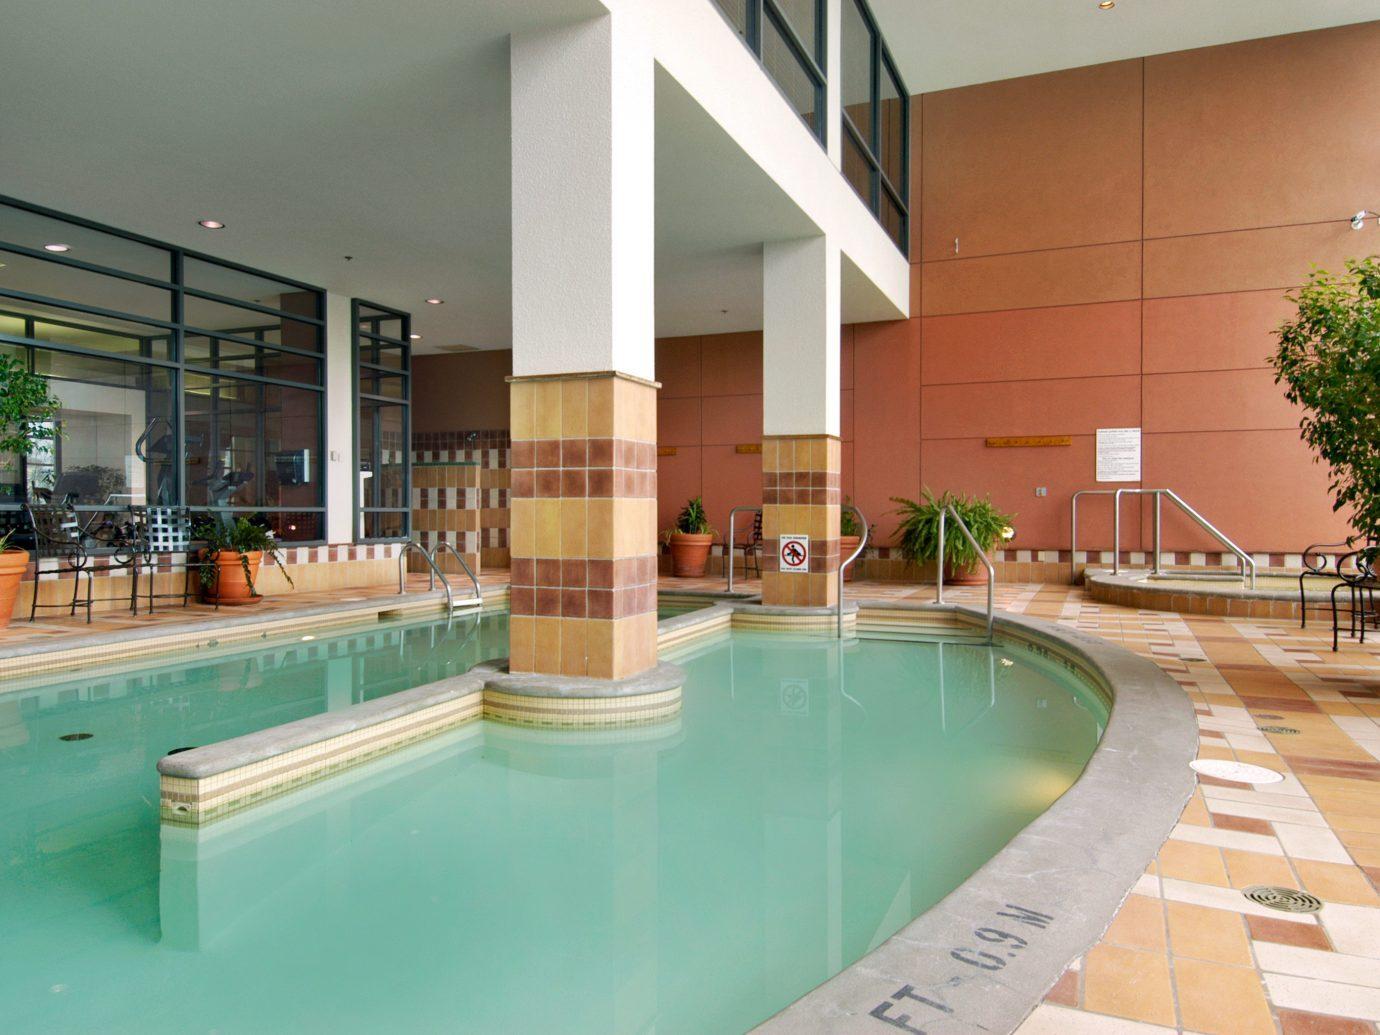 Pool at the Fairmont Tremblant, Mont-Tremblant, QC